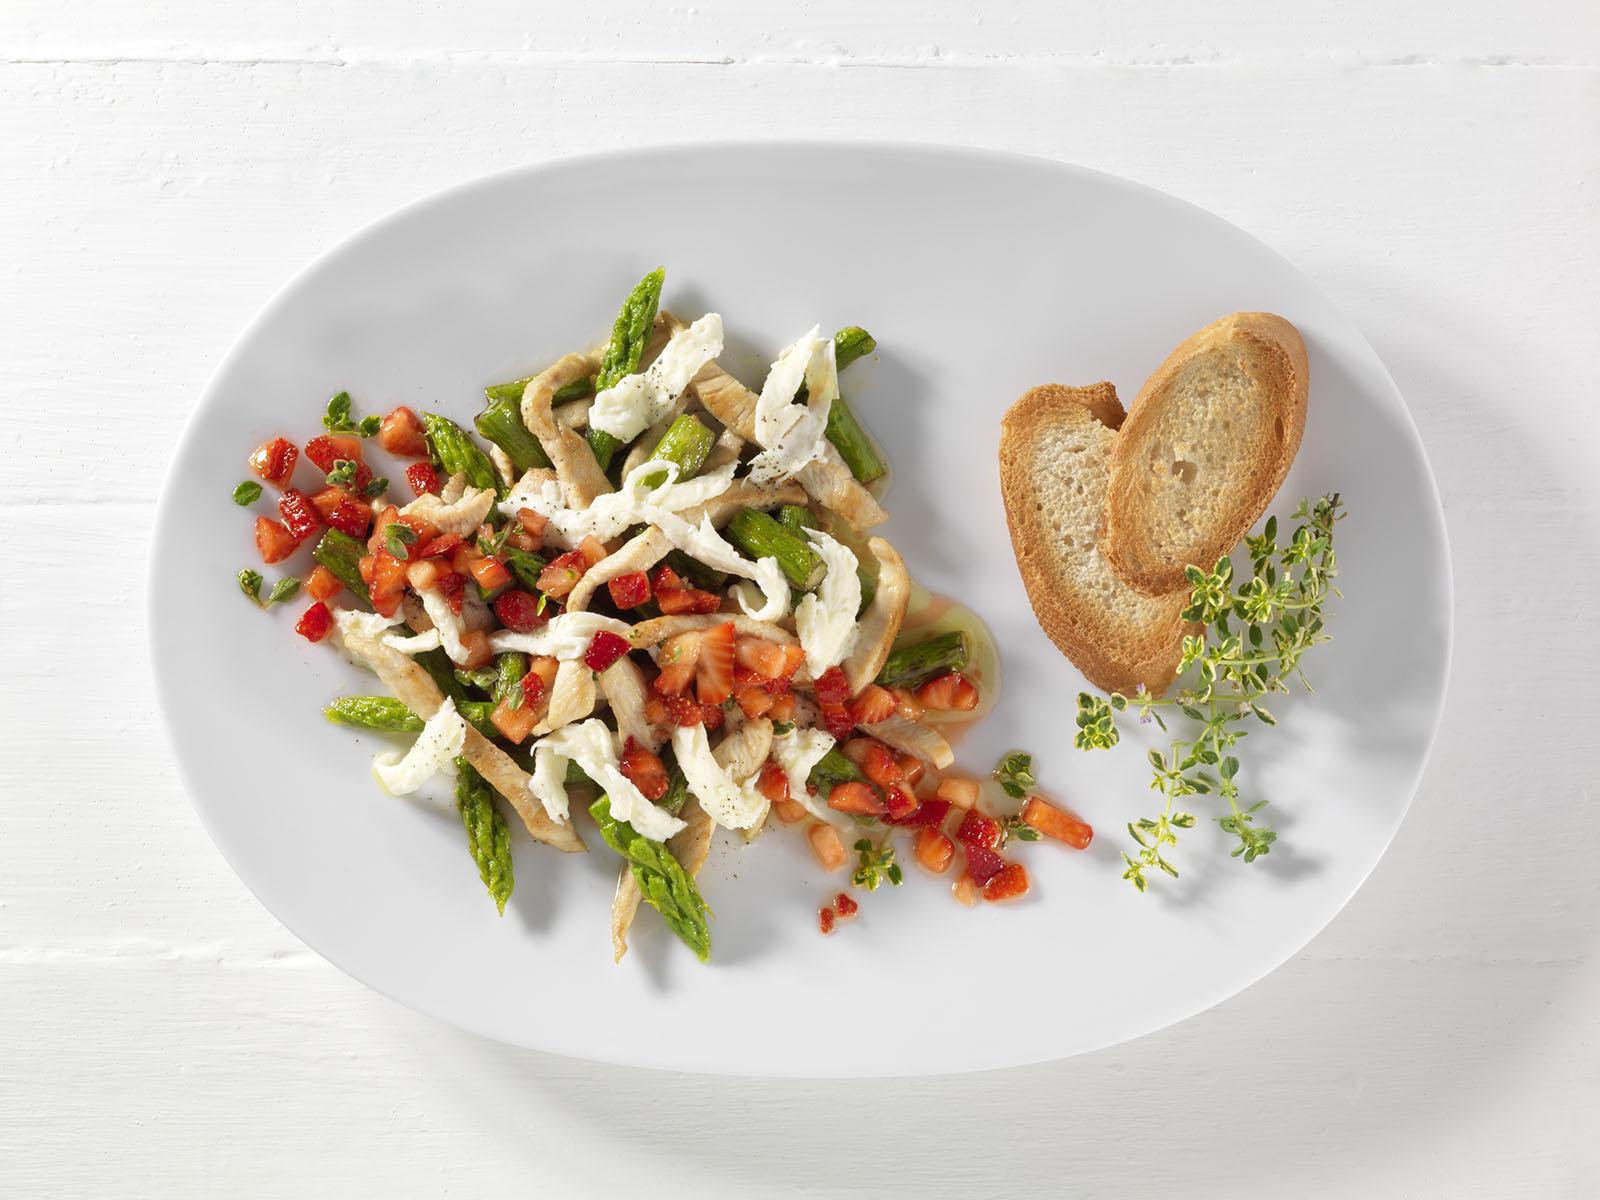 Spargel Haehnchen Salat Erdbeer Mozzarella